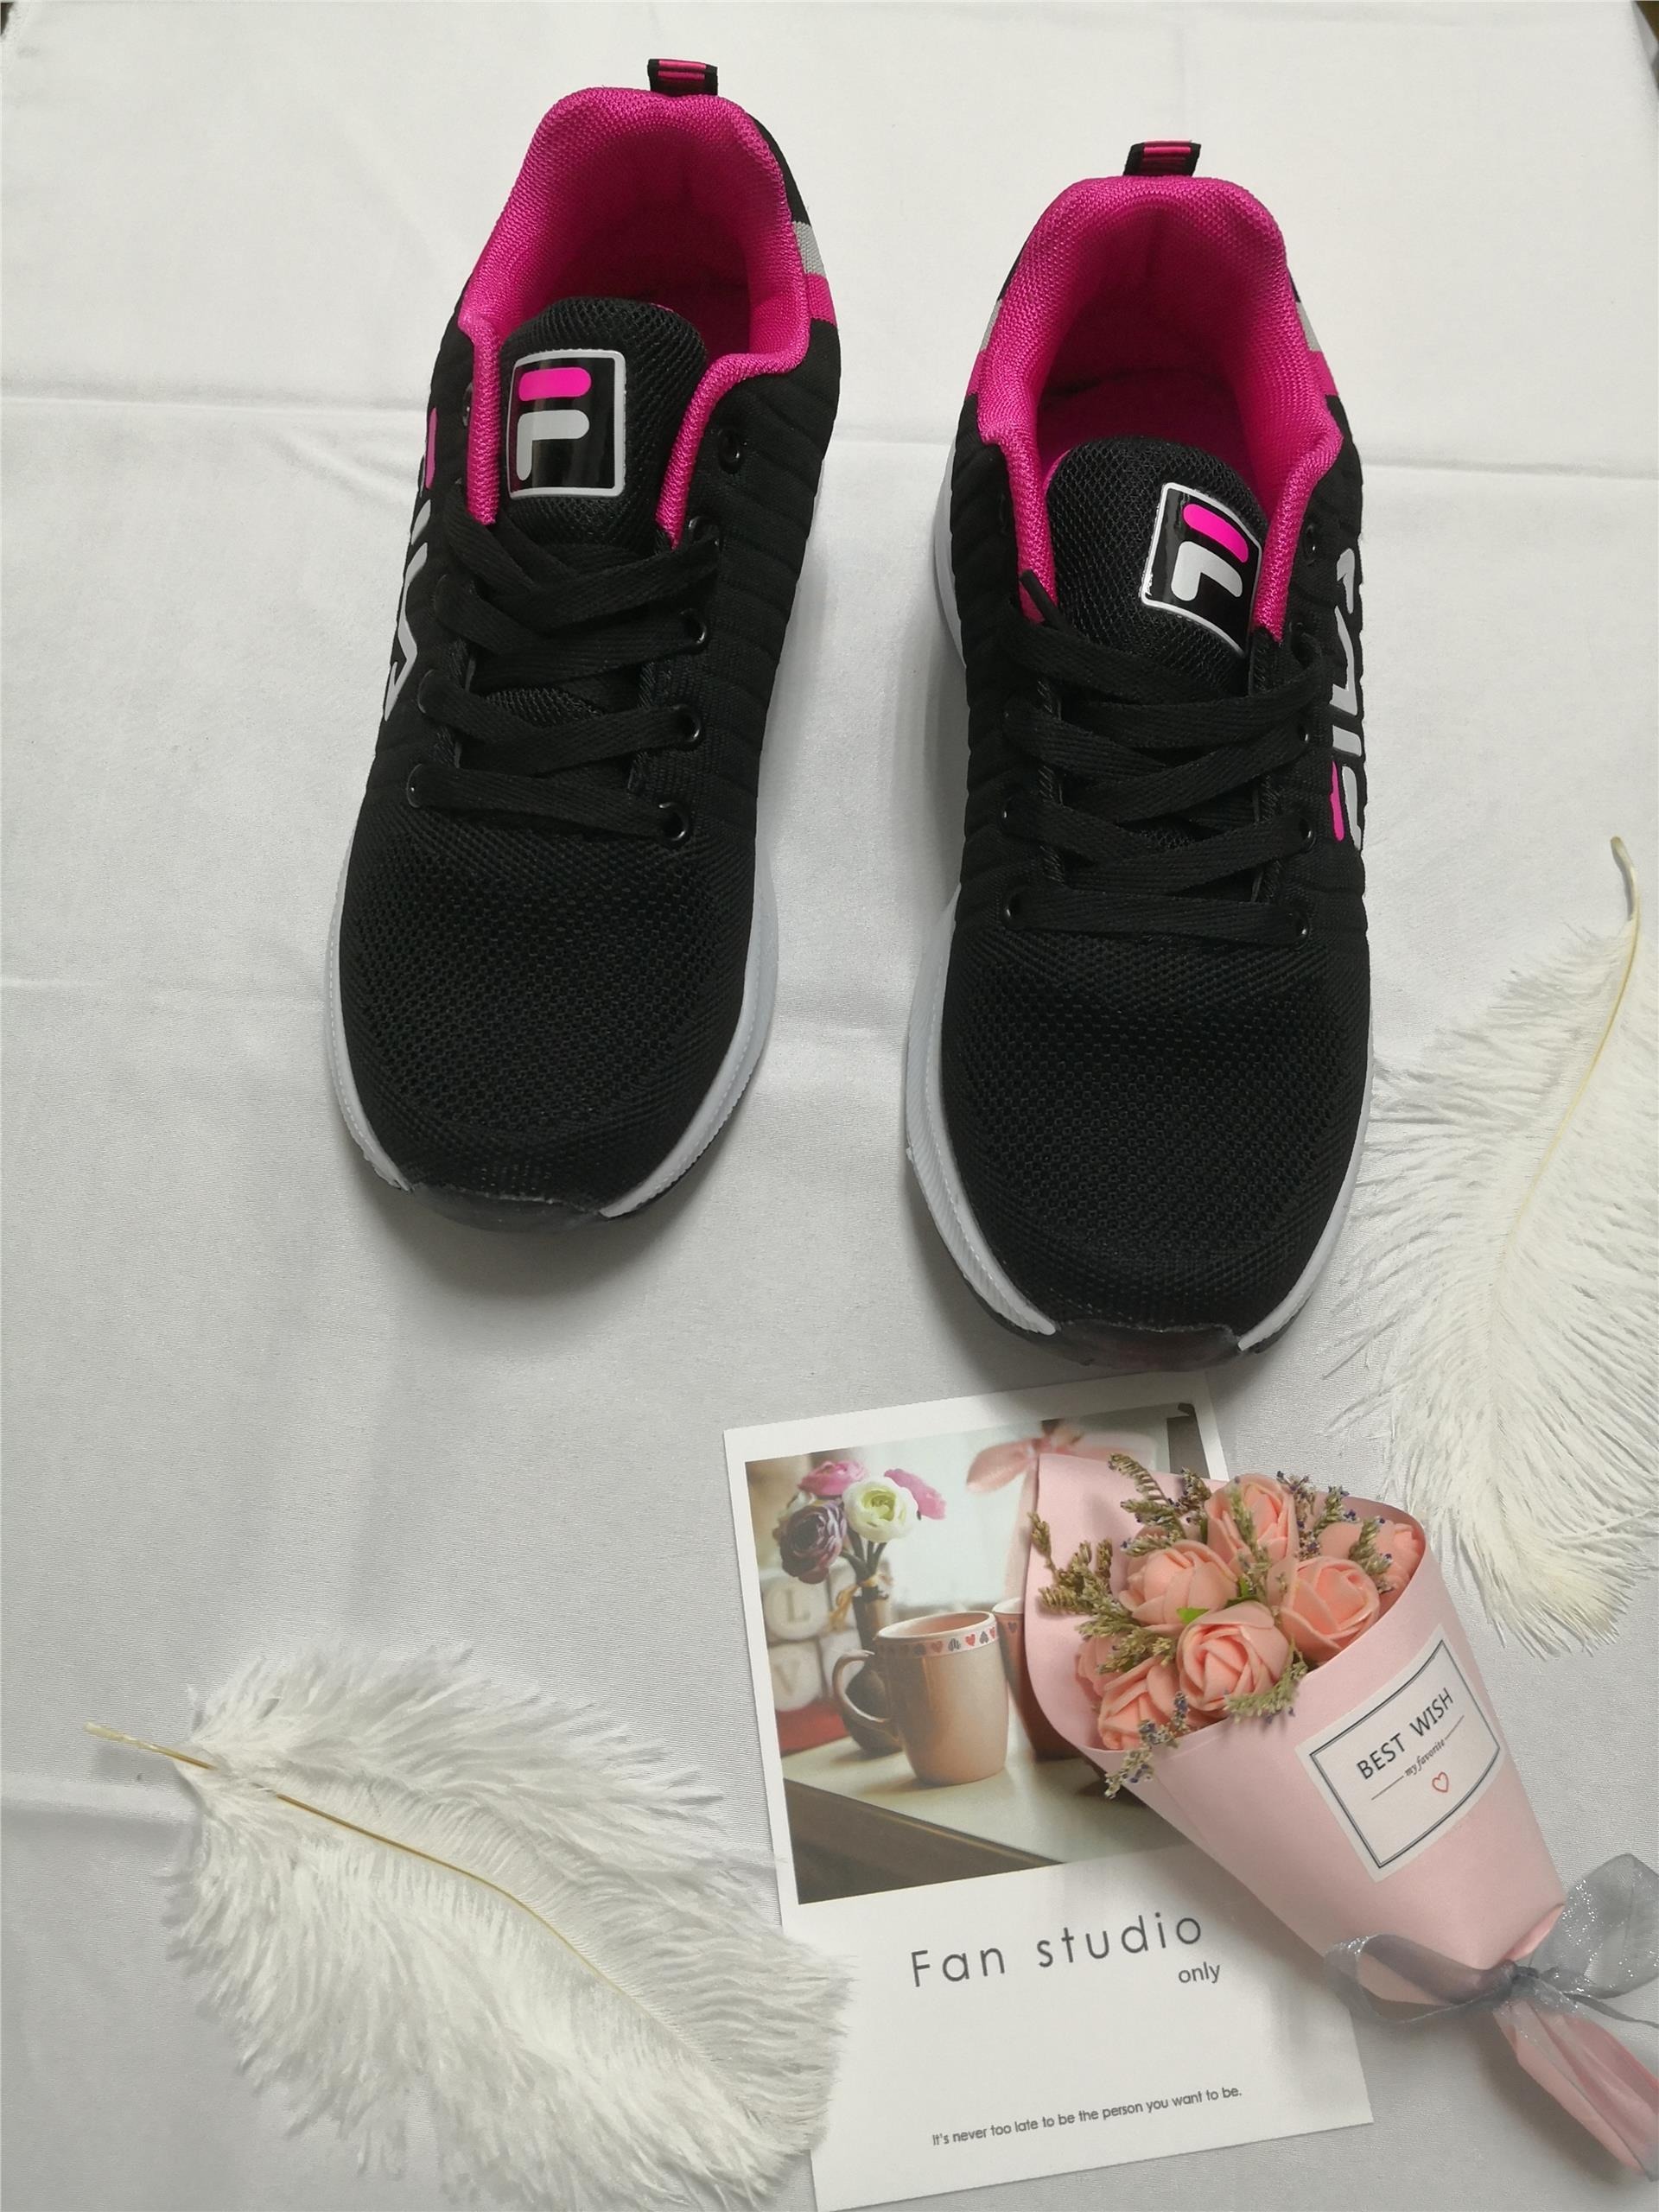 High end Product Off White x Nike Air Max 90 KPU Black White 875695 008 Women's Men's Sportswear Running Shoes #875695 008